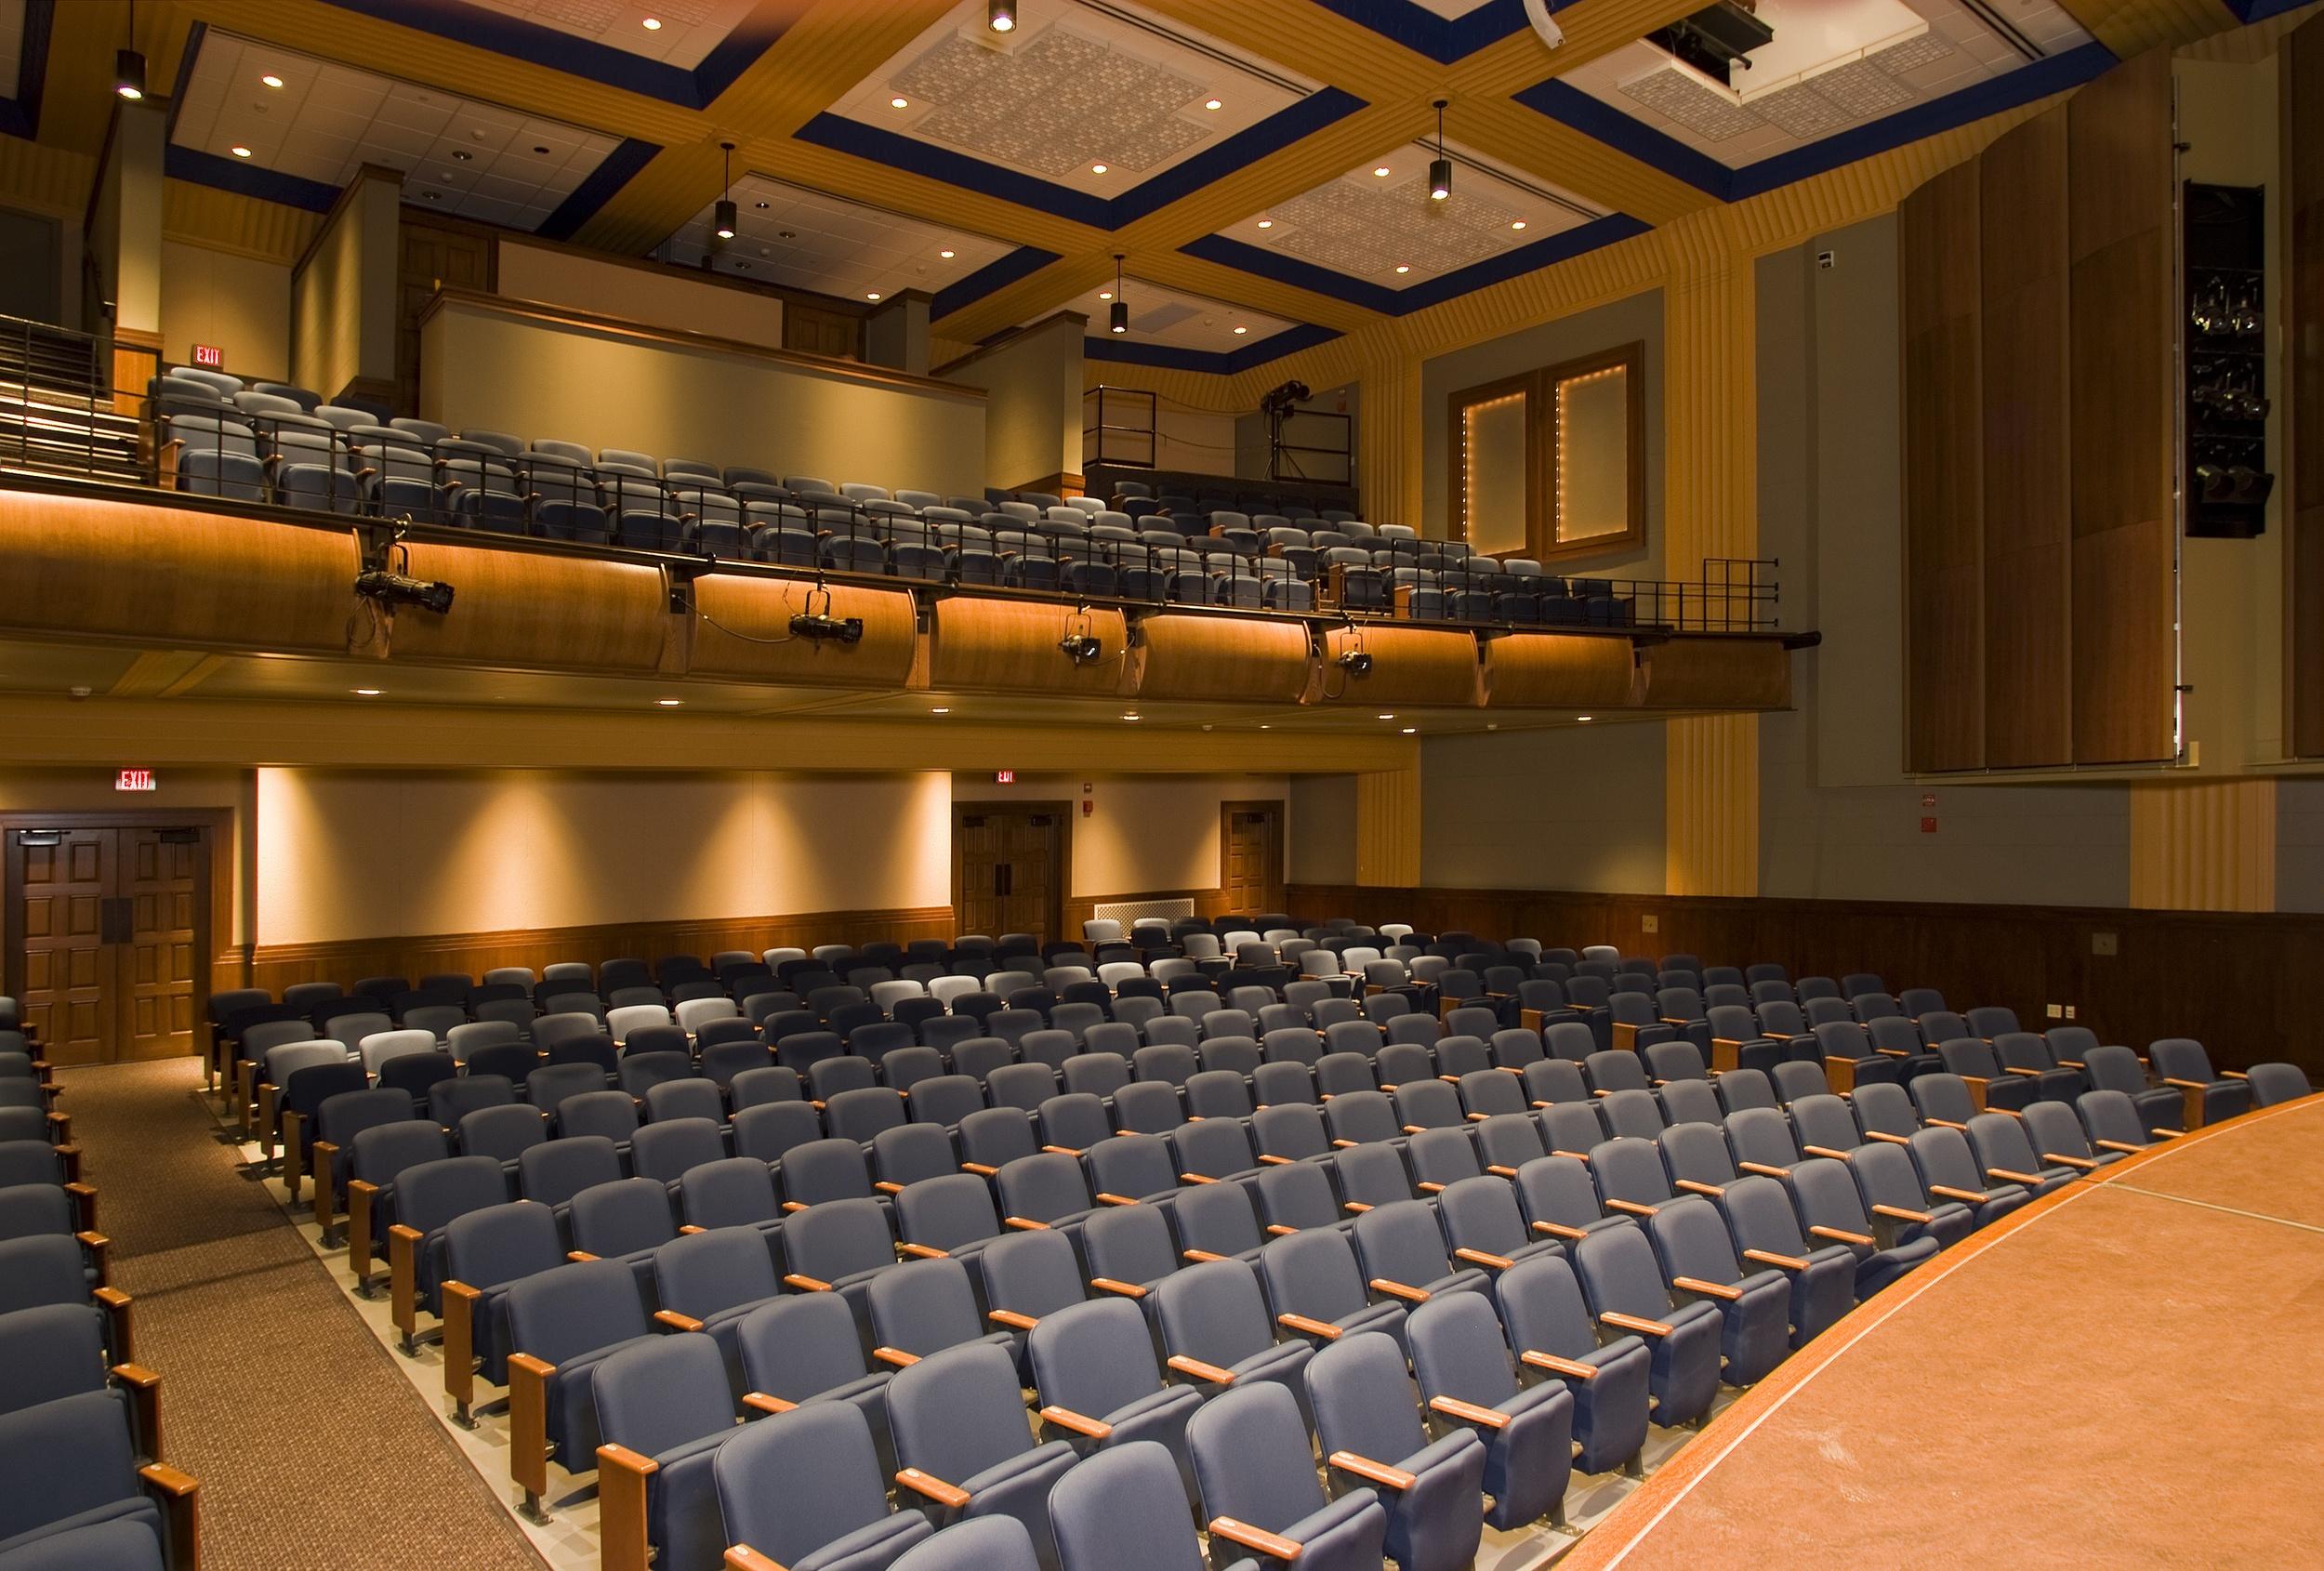 Indiana State University College of Education Auditorium